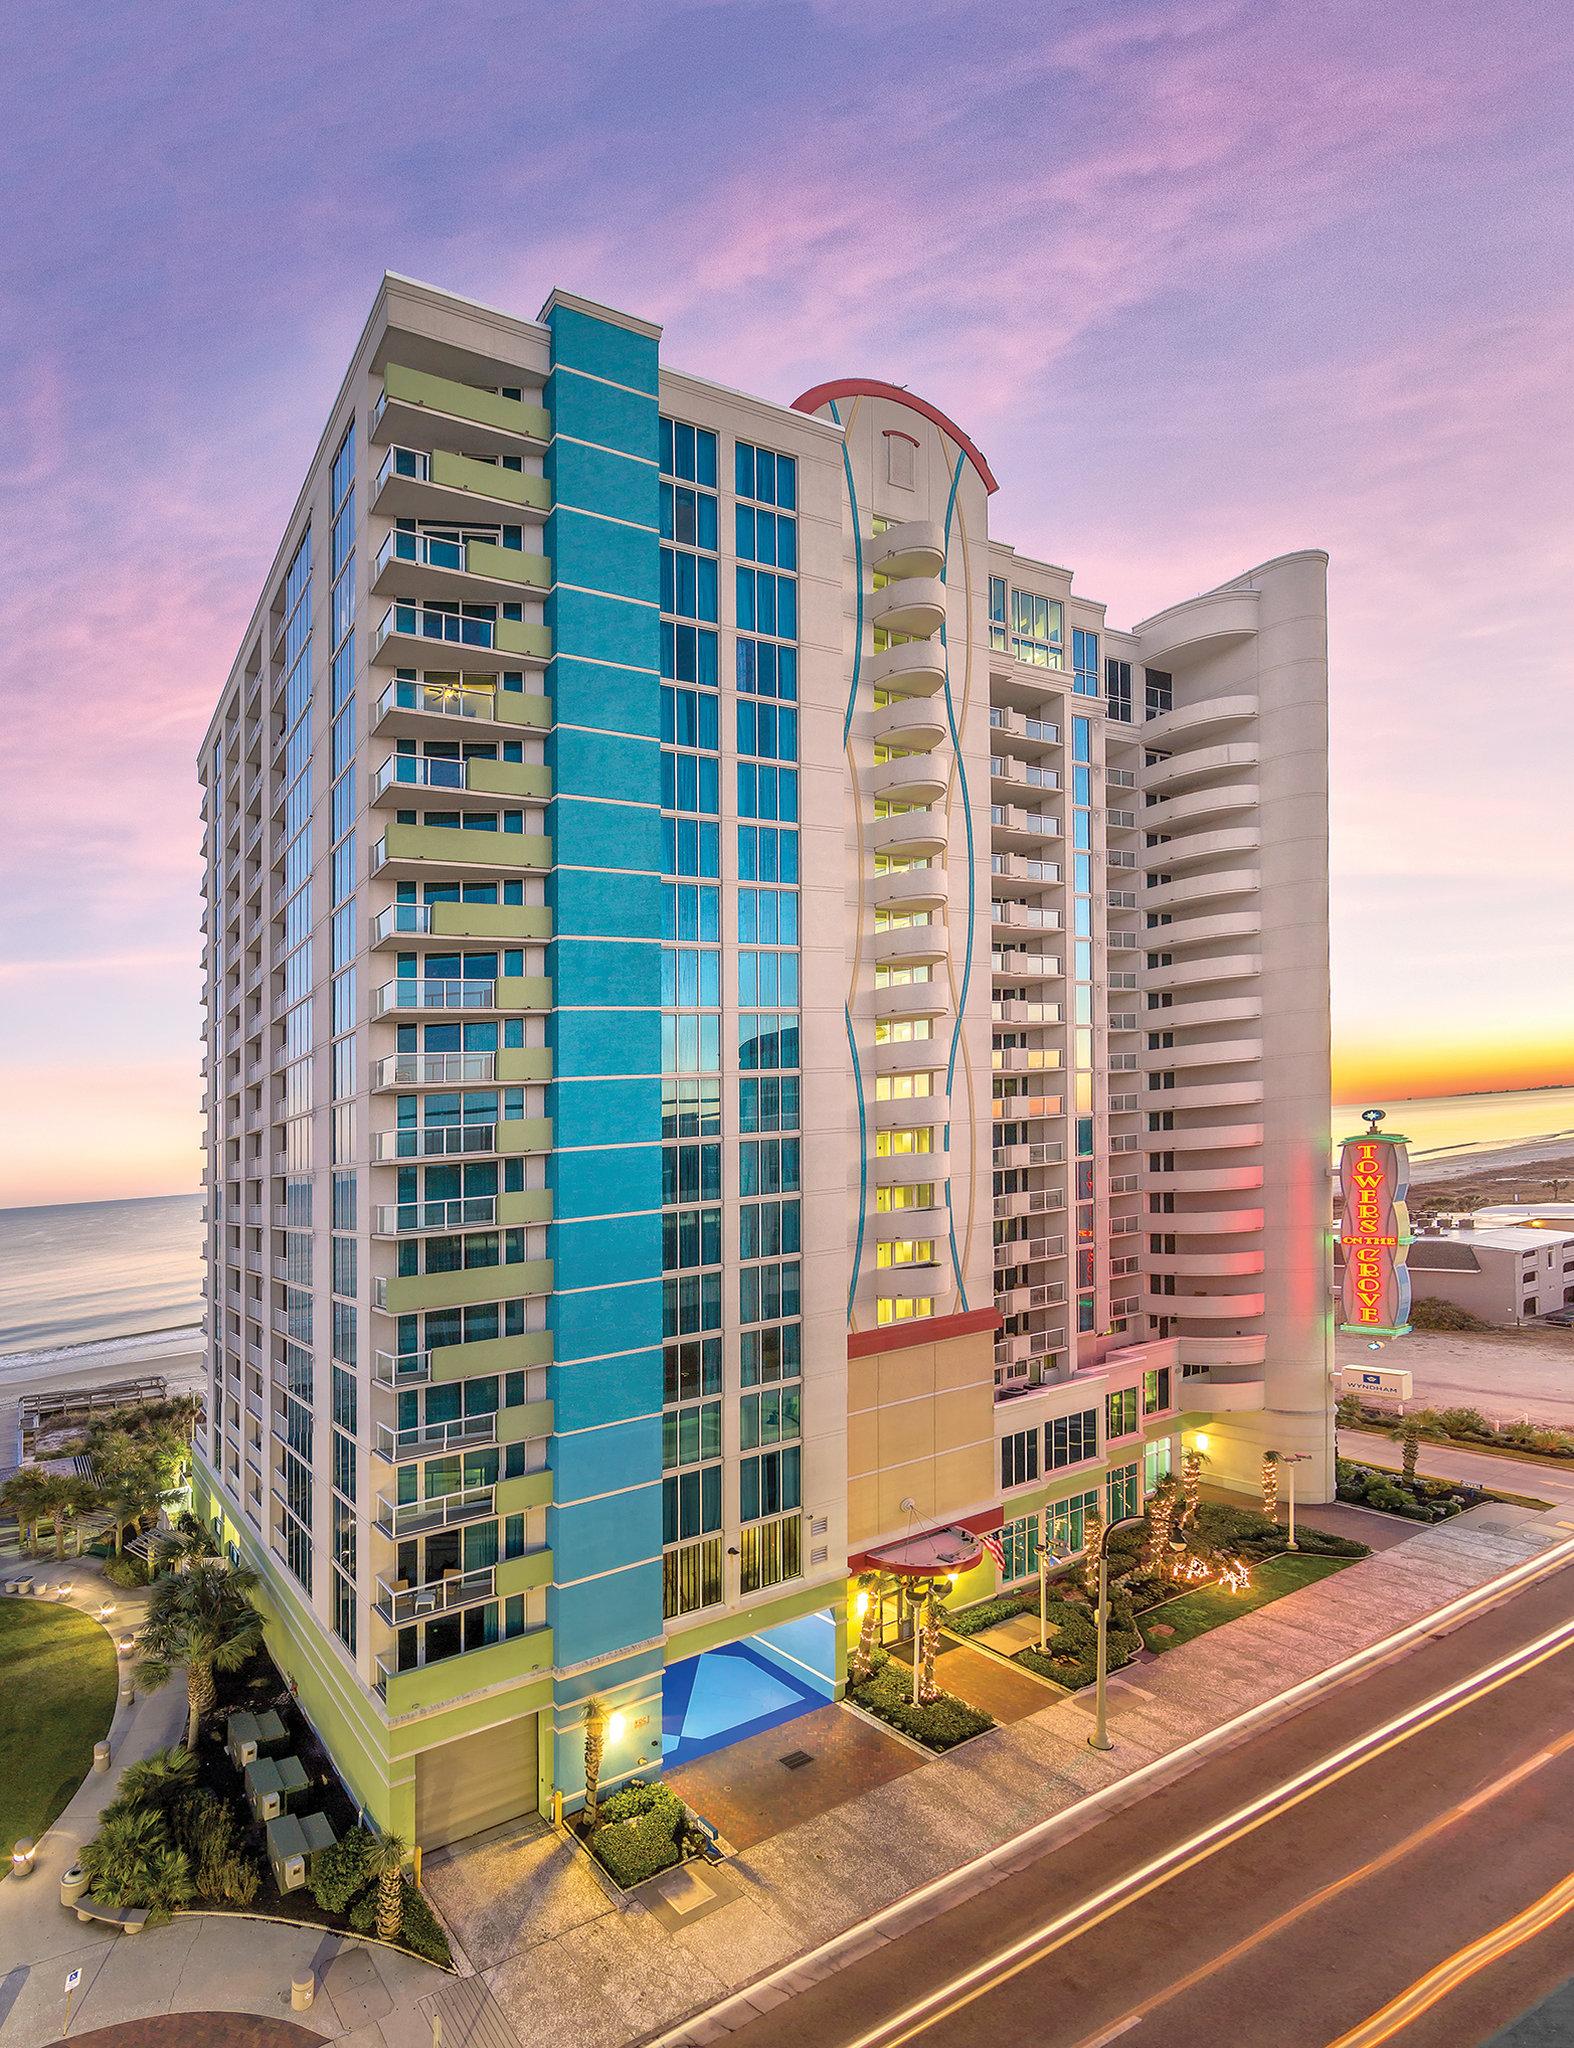 myrtle beach wyndham hotels 2018 world 39 s best hotels. Black Bedroom Furniture Sets. Home Design Ideas